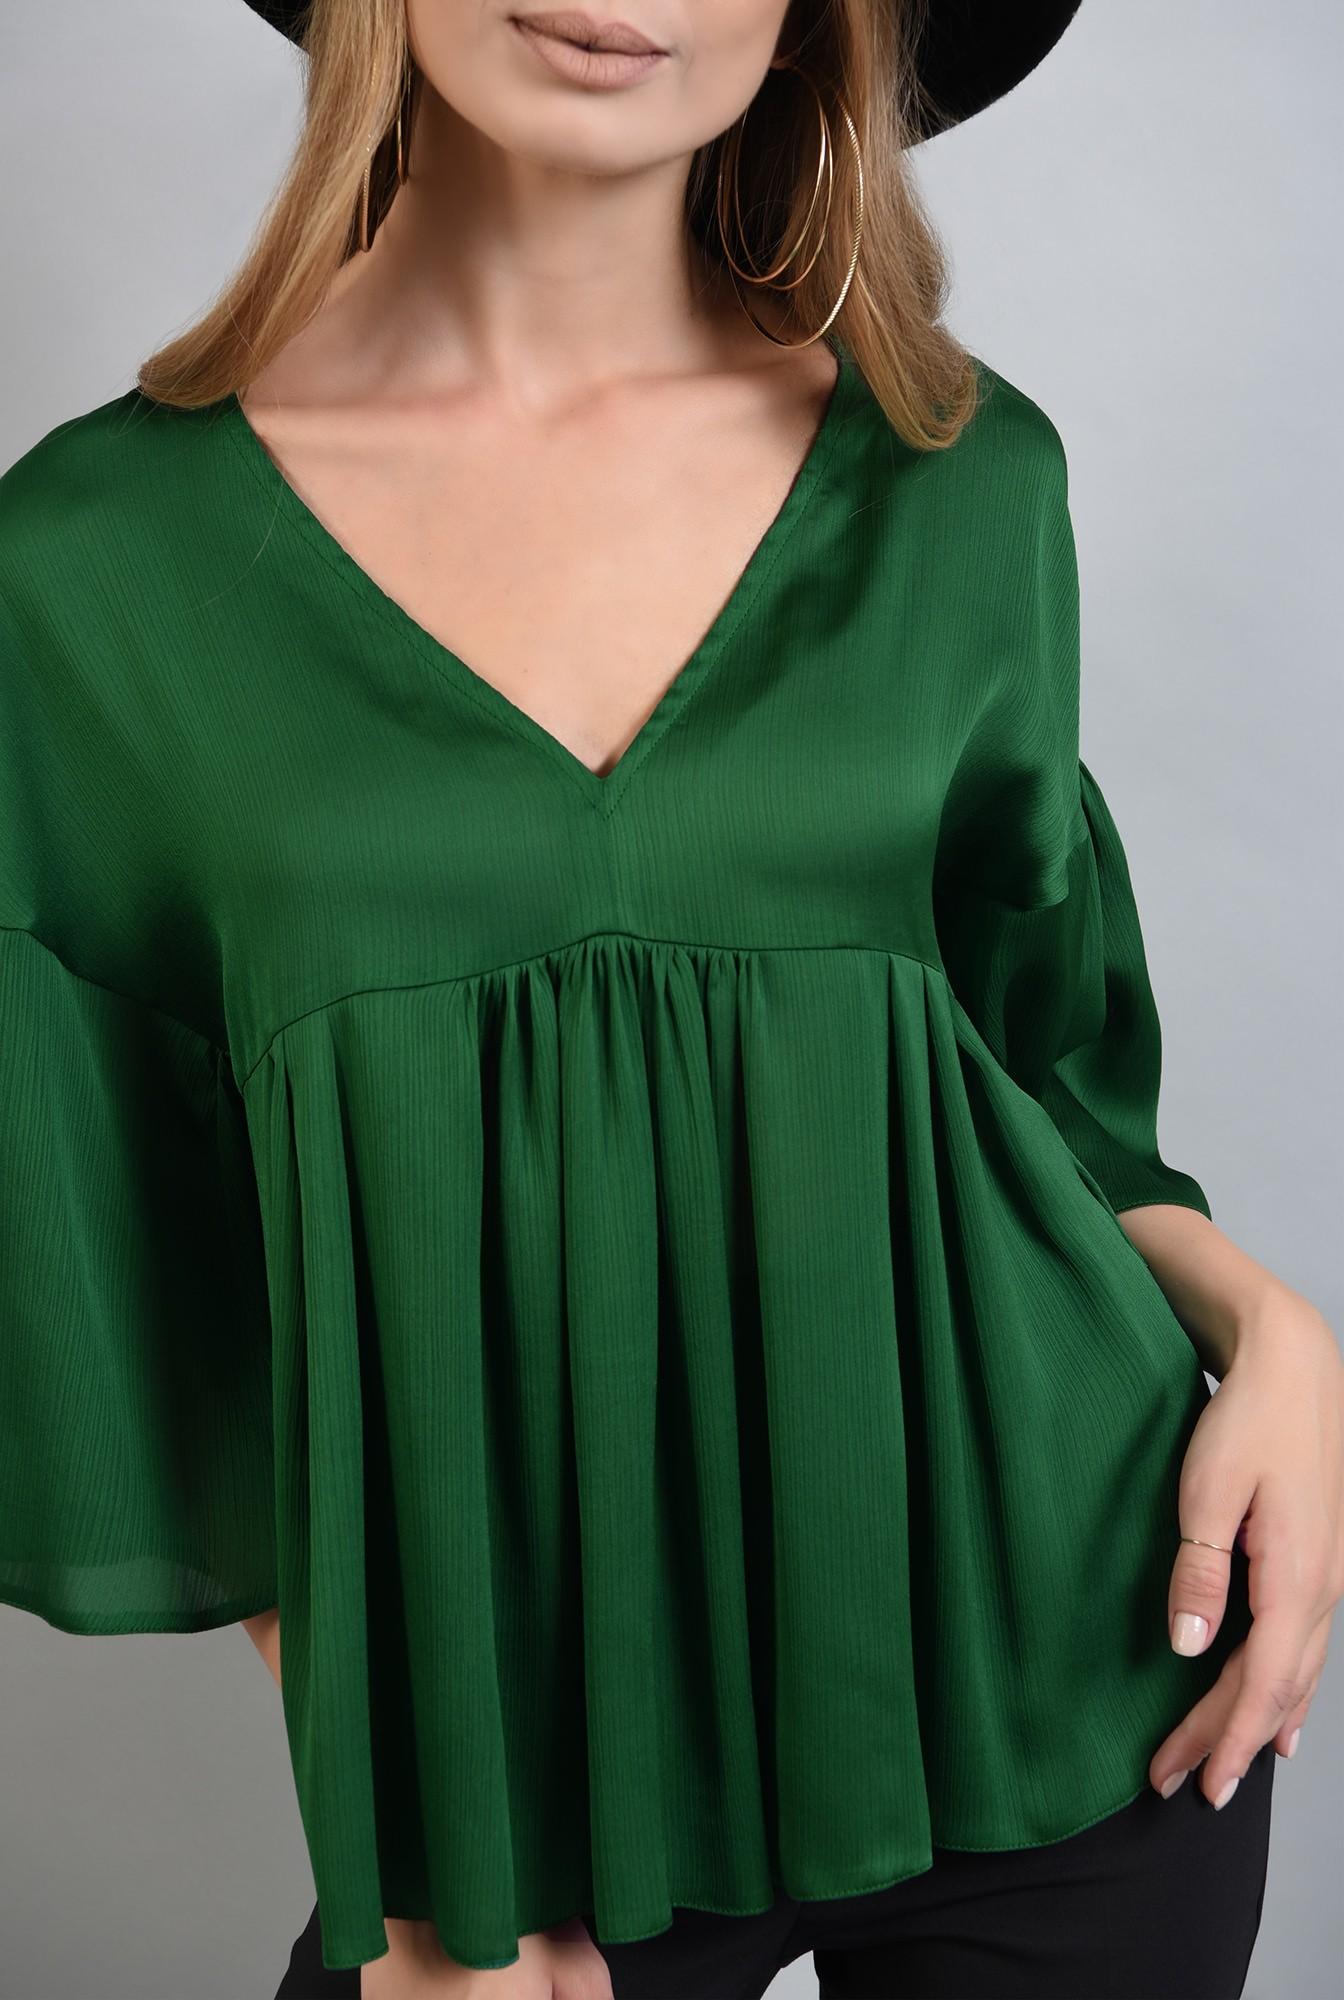 2 - bluza larga, verde, cu peplum